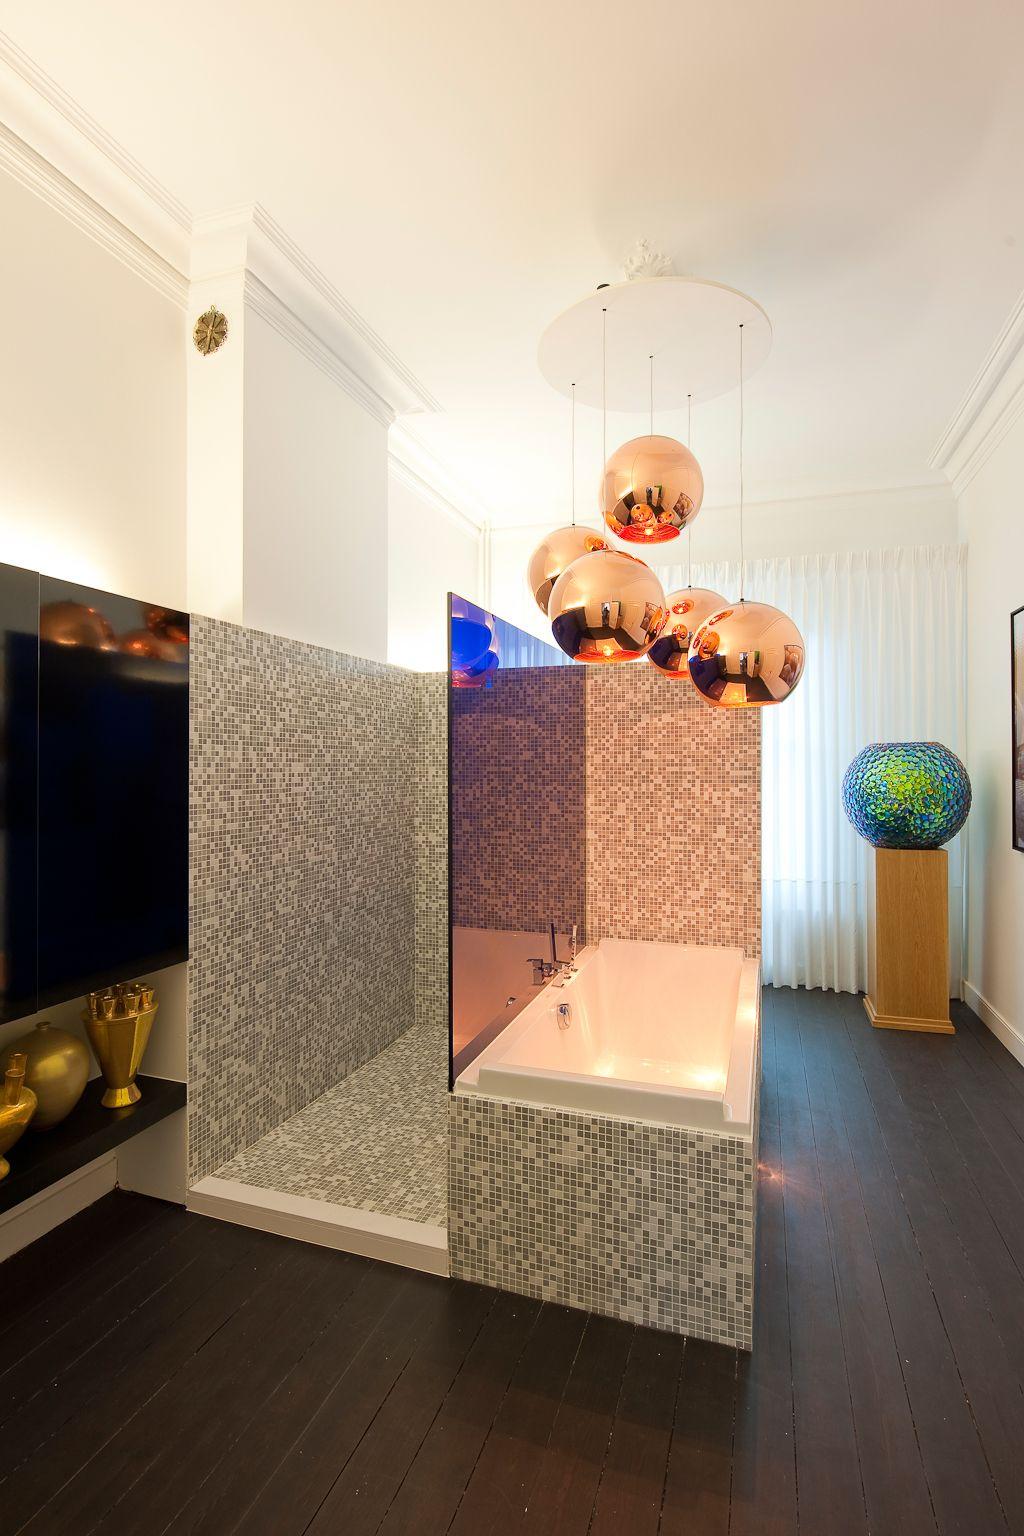 maffe badkamer | Bathrooms | Pinterest